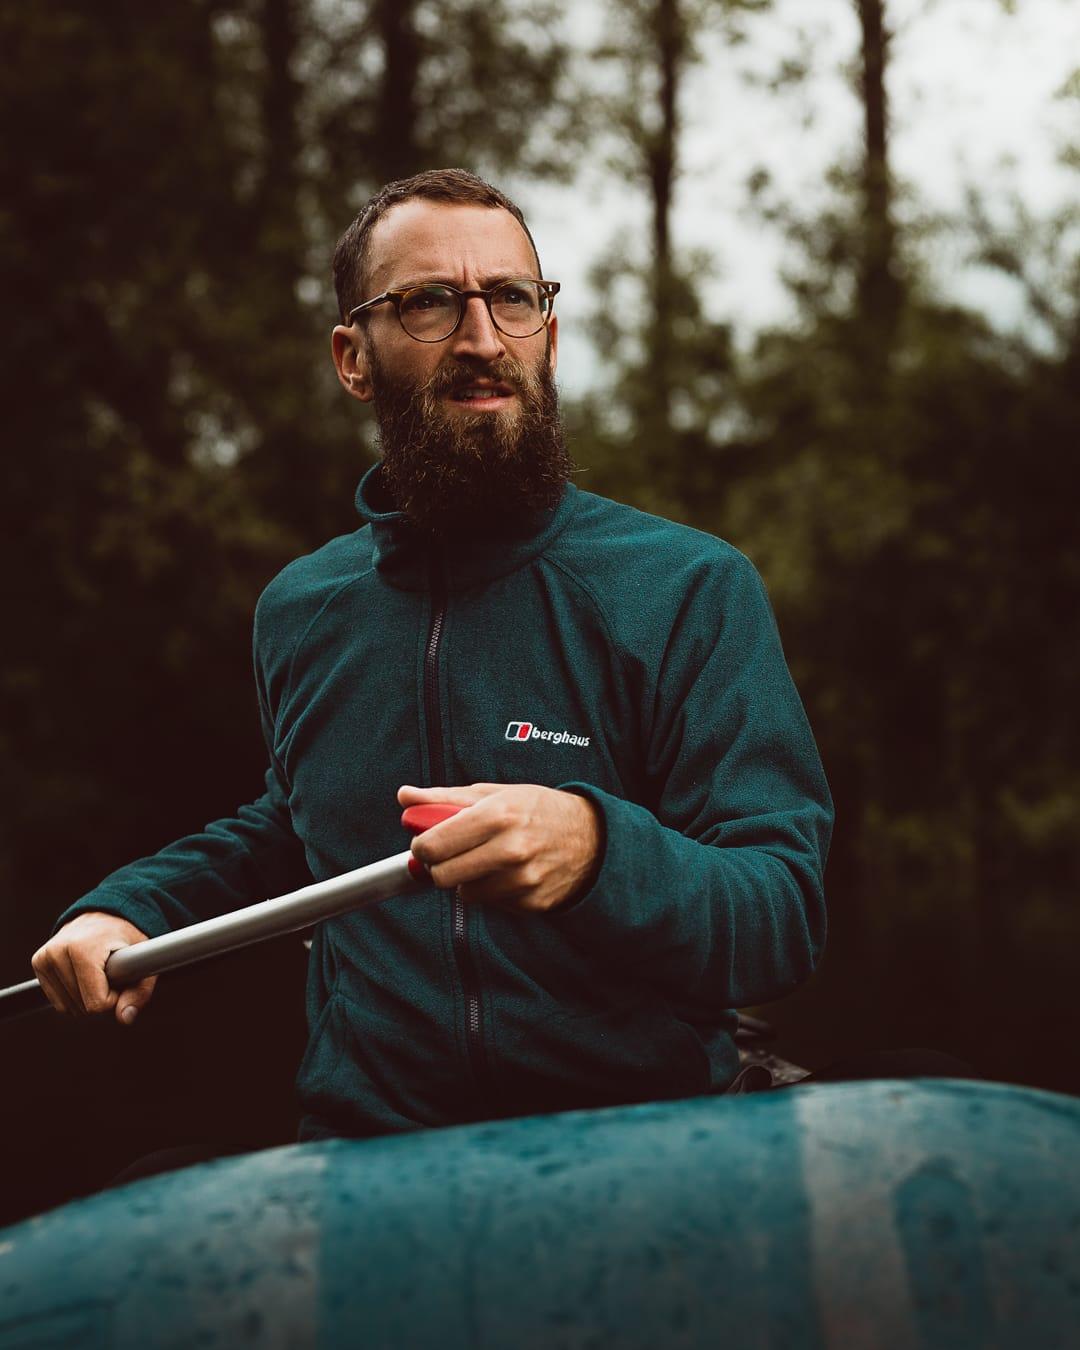 River Wye, 2 day Canoe Trip – June 2018